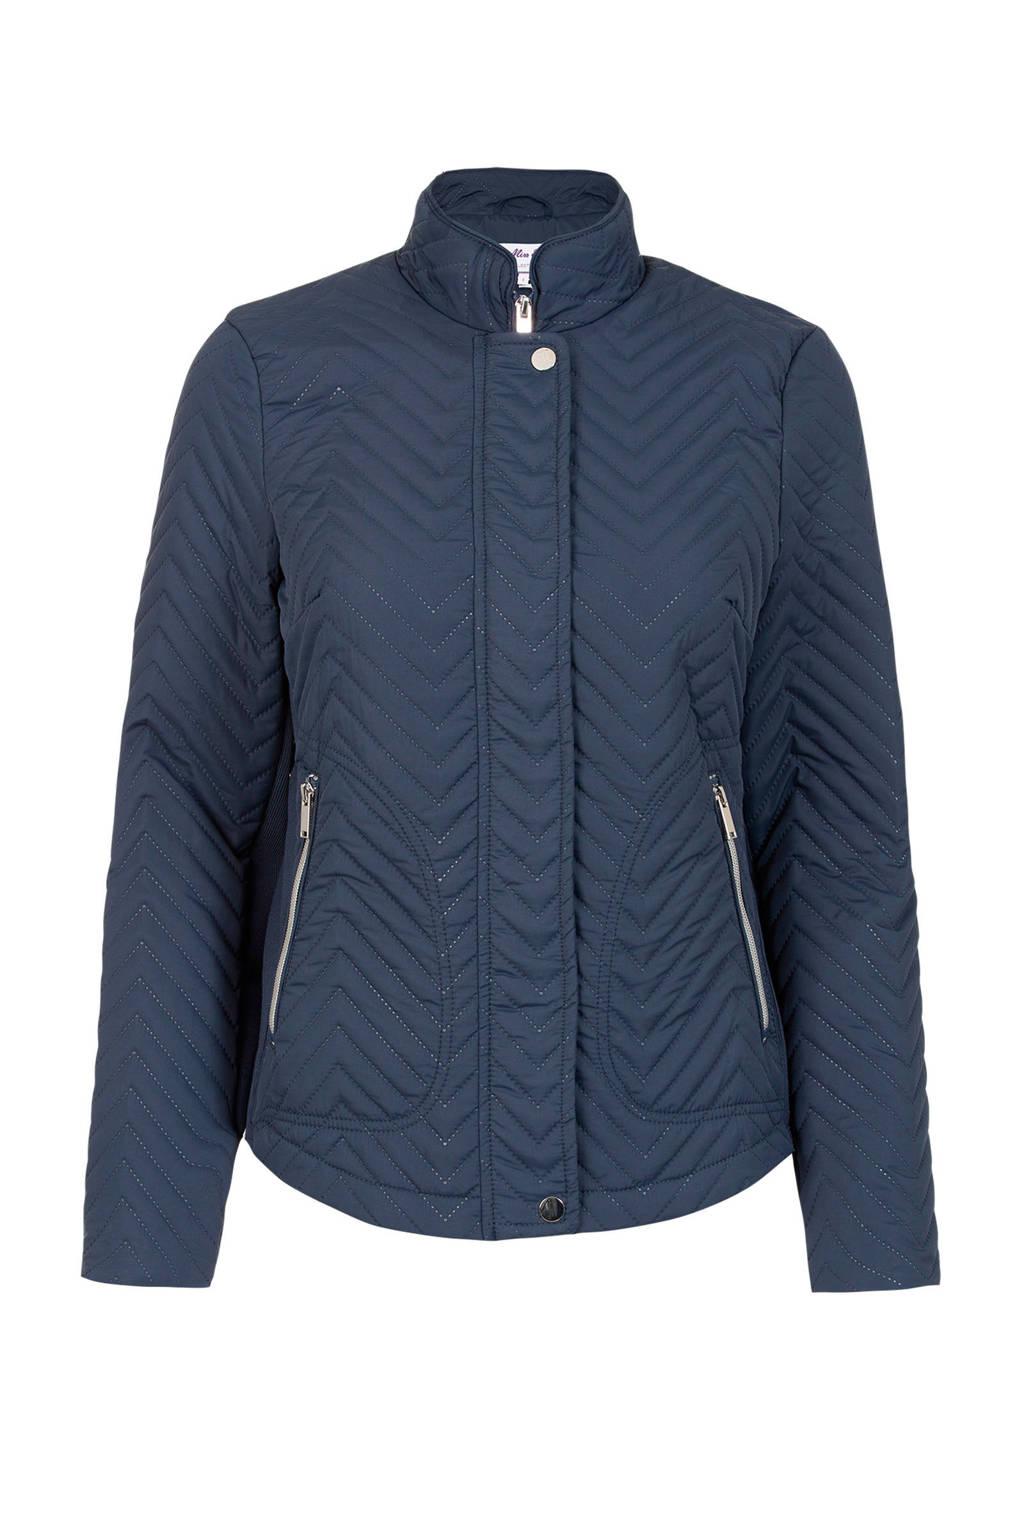 Miss Etam Regulier gewatteerde jas blauw, Blauw